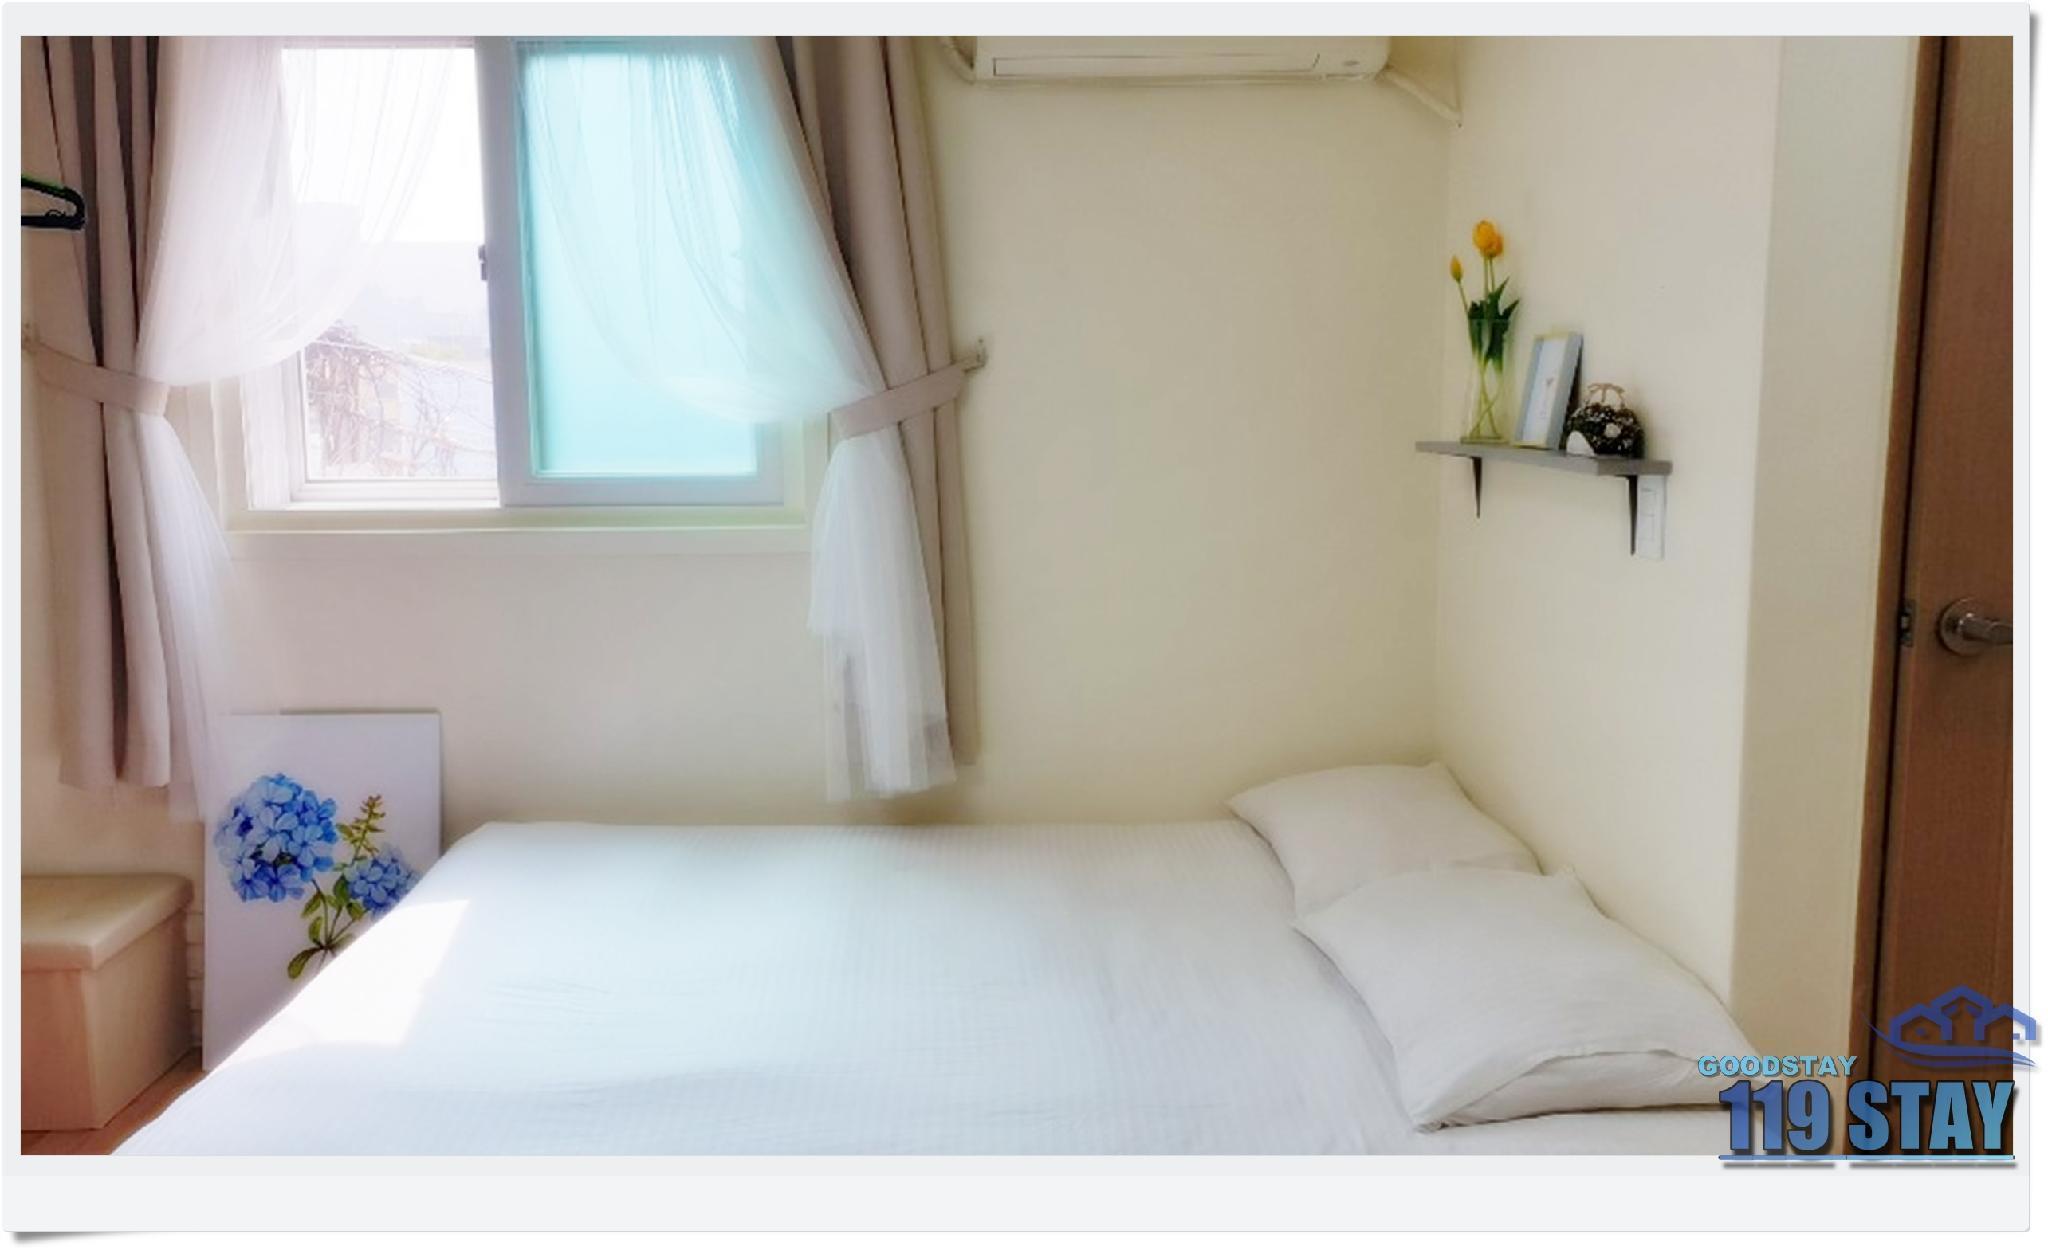 Myeongdong119stay